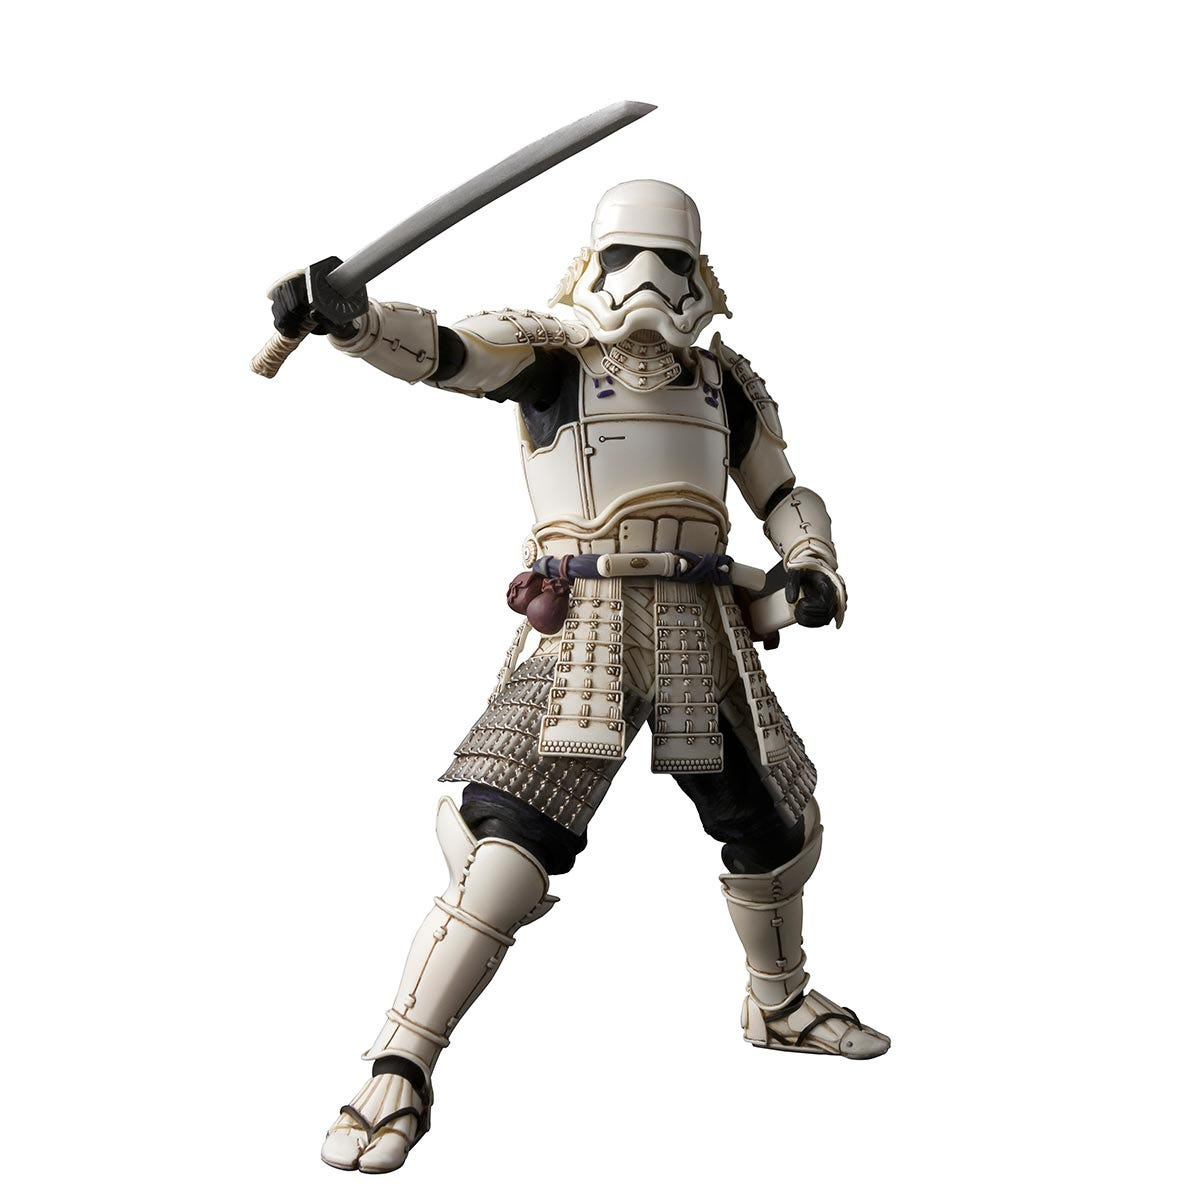 "Bandai Ashigaru First Order Storm Trooper ""Star Wars"", Meisho Movie Realization"